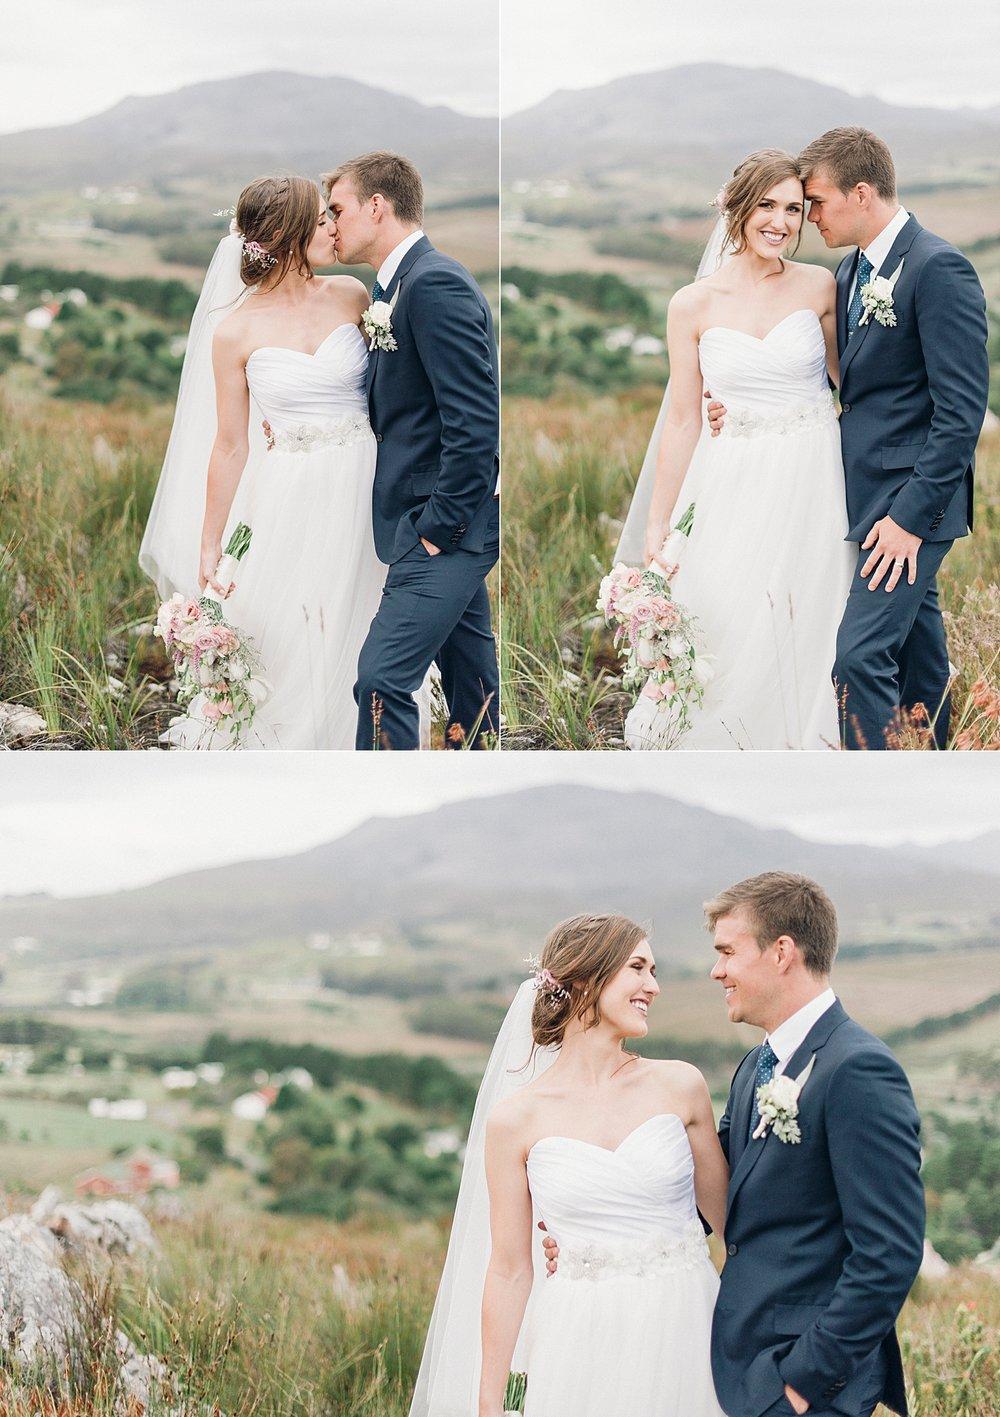 RyanParker_WeddingPhotographer_CapeTown_BonaDea_Hermanus_S&A_DSC_2013.jpg